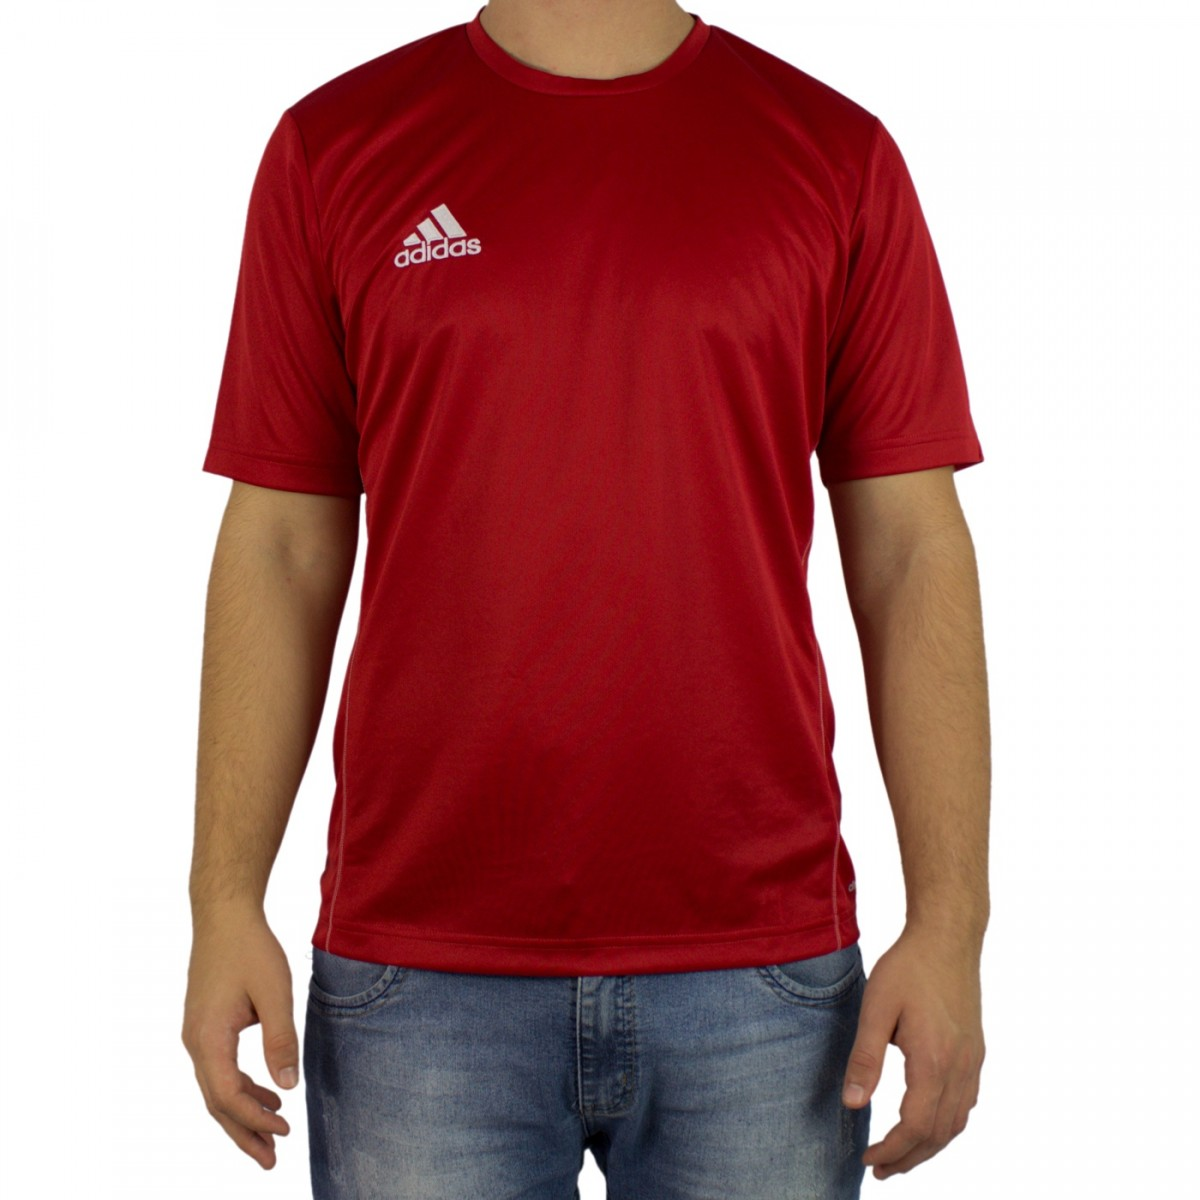 ... Bizz Store - Camiseta Masculina Adidas Core 15 Cinza Treino  b135d930205601 ... 15849e689fb15